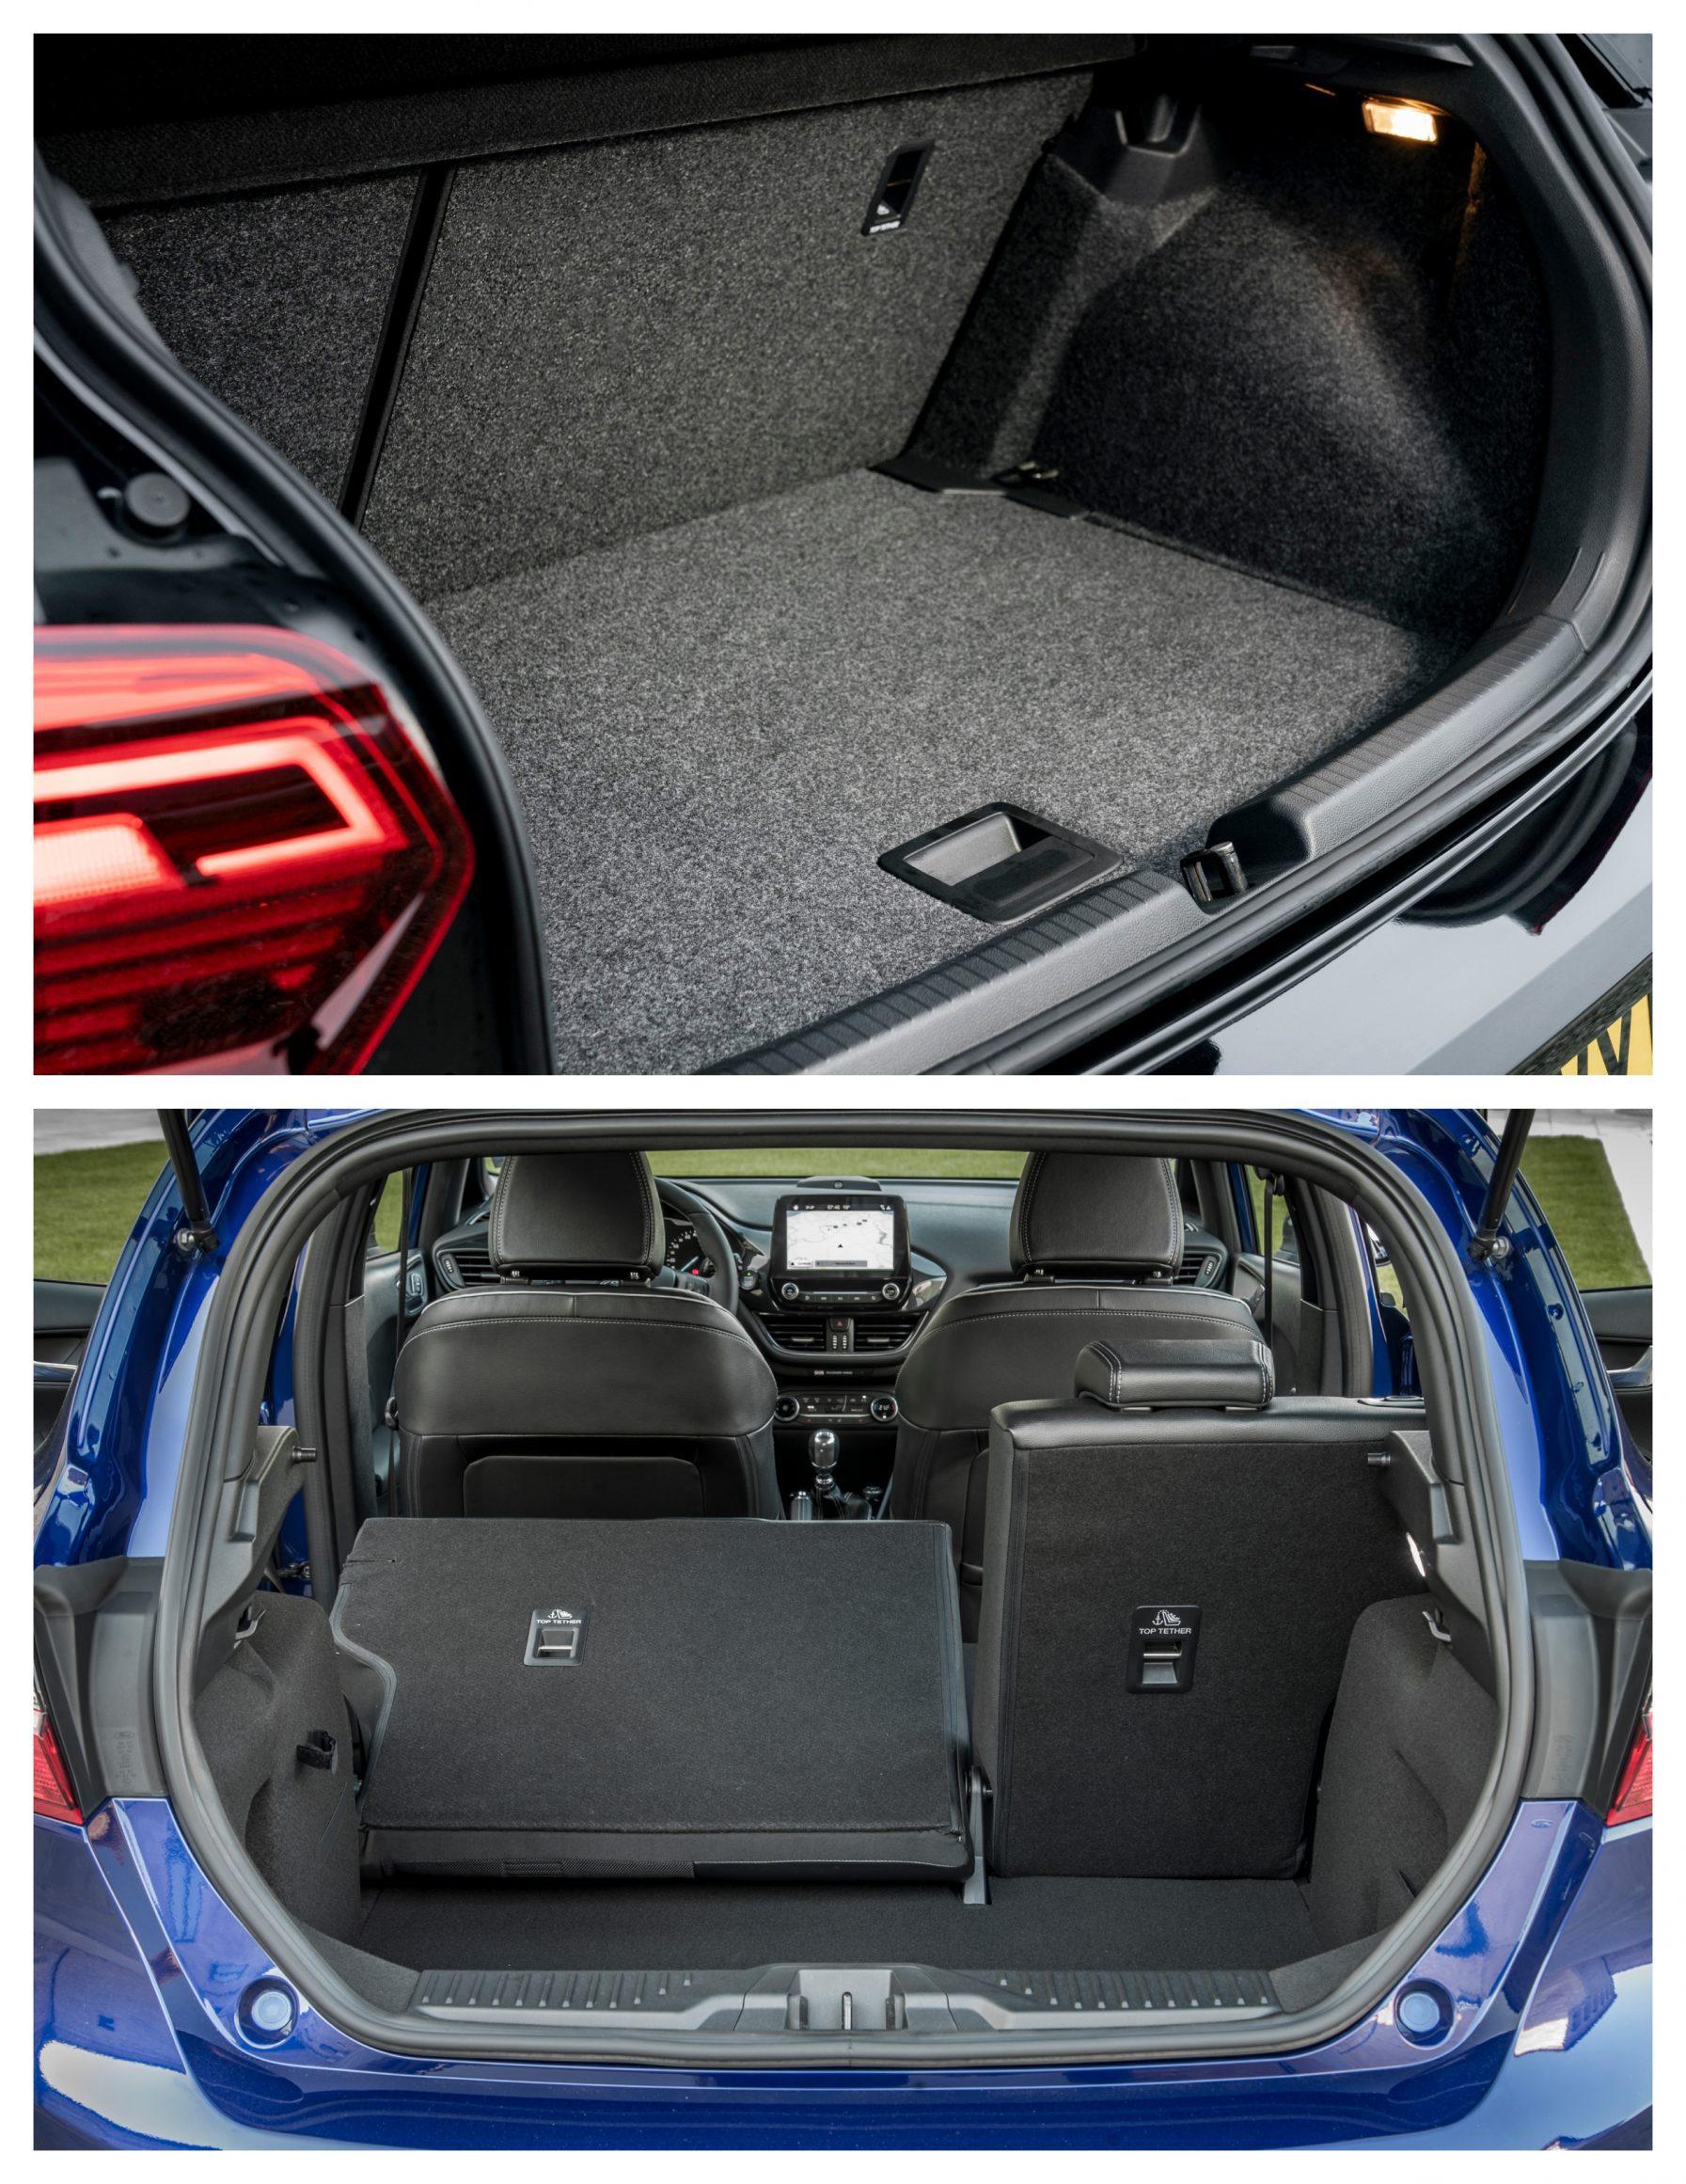 Polo Vs Fiesta - boot space